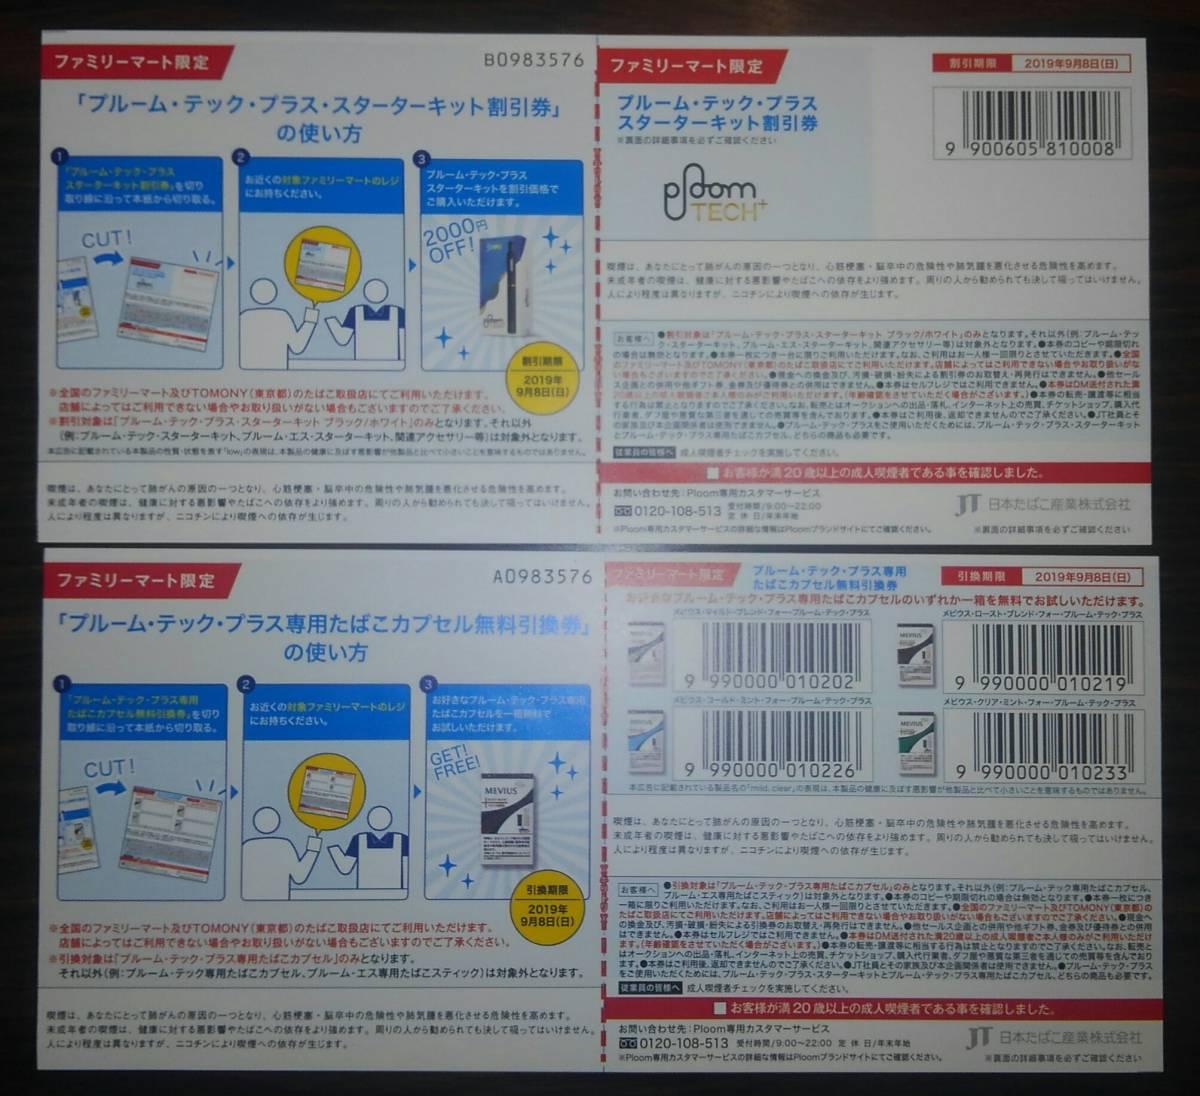 Ploom TECH+ プルーム・テック・プラス スターターキット 割引券 2000円 of タバコカプセル1箱 無料引換券 (ファミリーマート限定 )